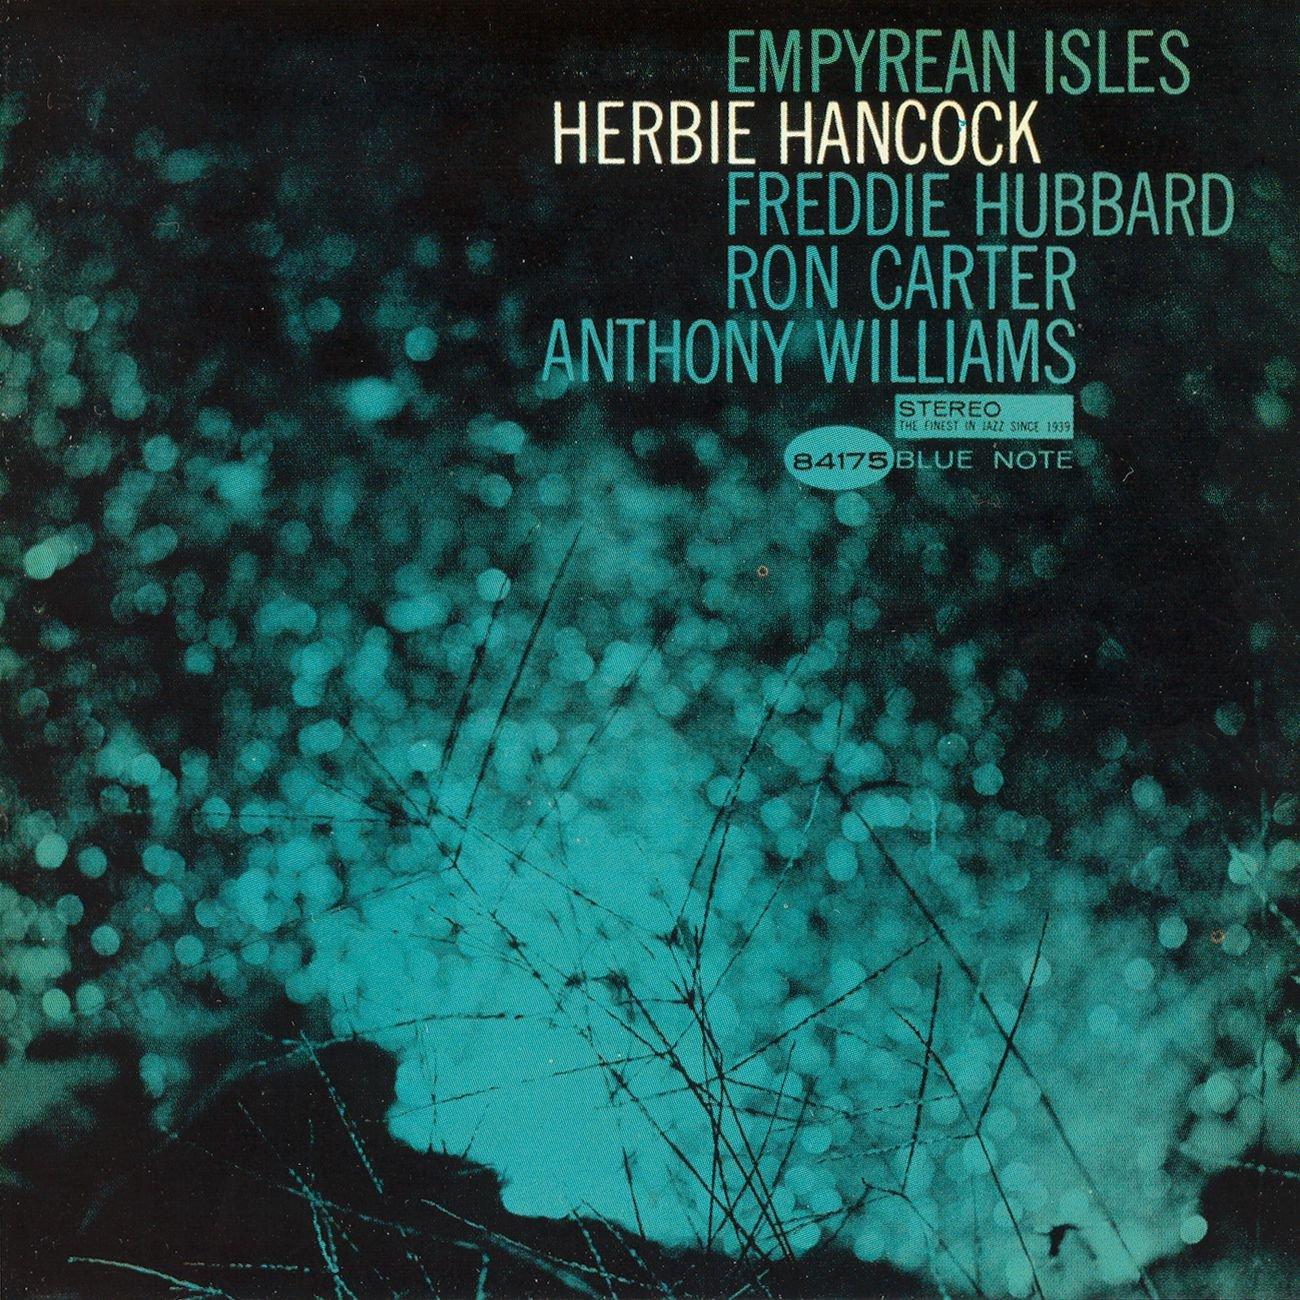 Herbie Hancock - Empyrean Isles - Amazon.com Music